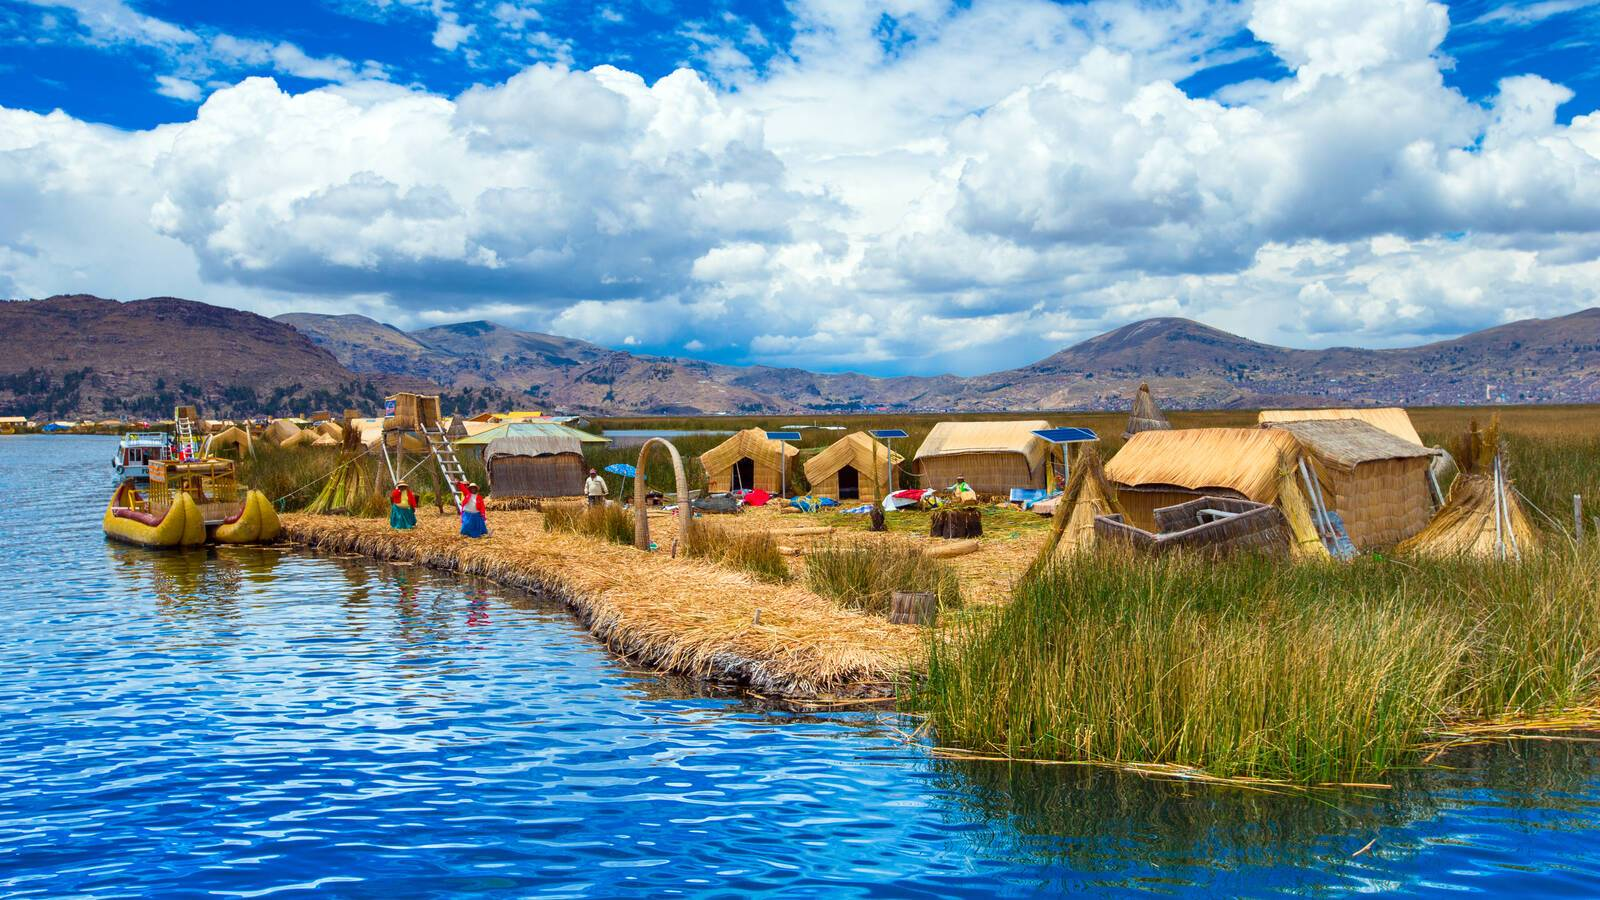 Titicaca Lac Habitation Traditionnelle Perou Pakhnyushchyy